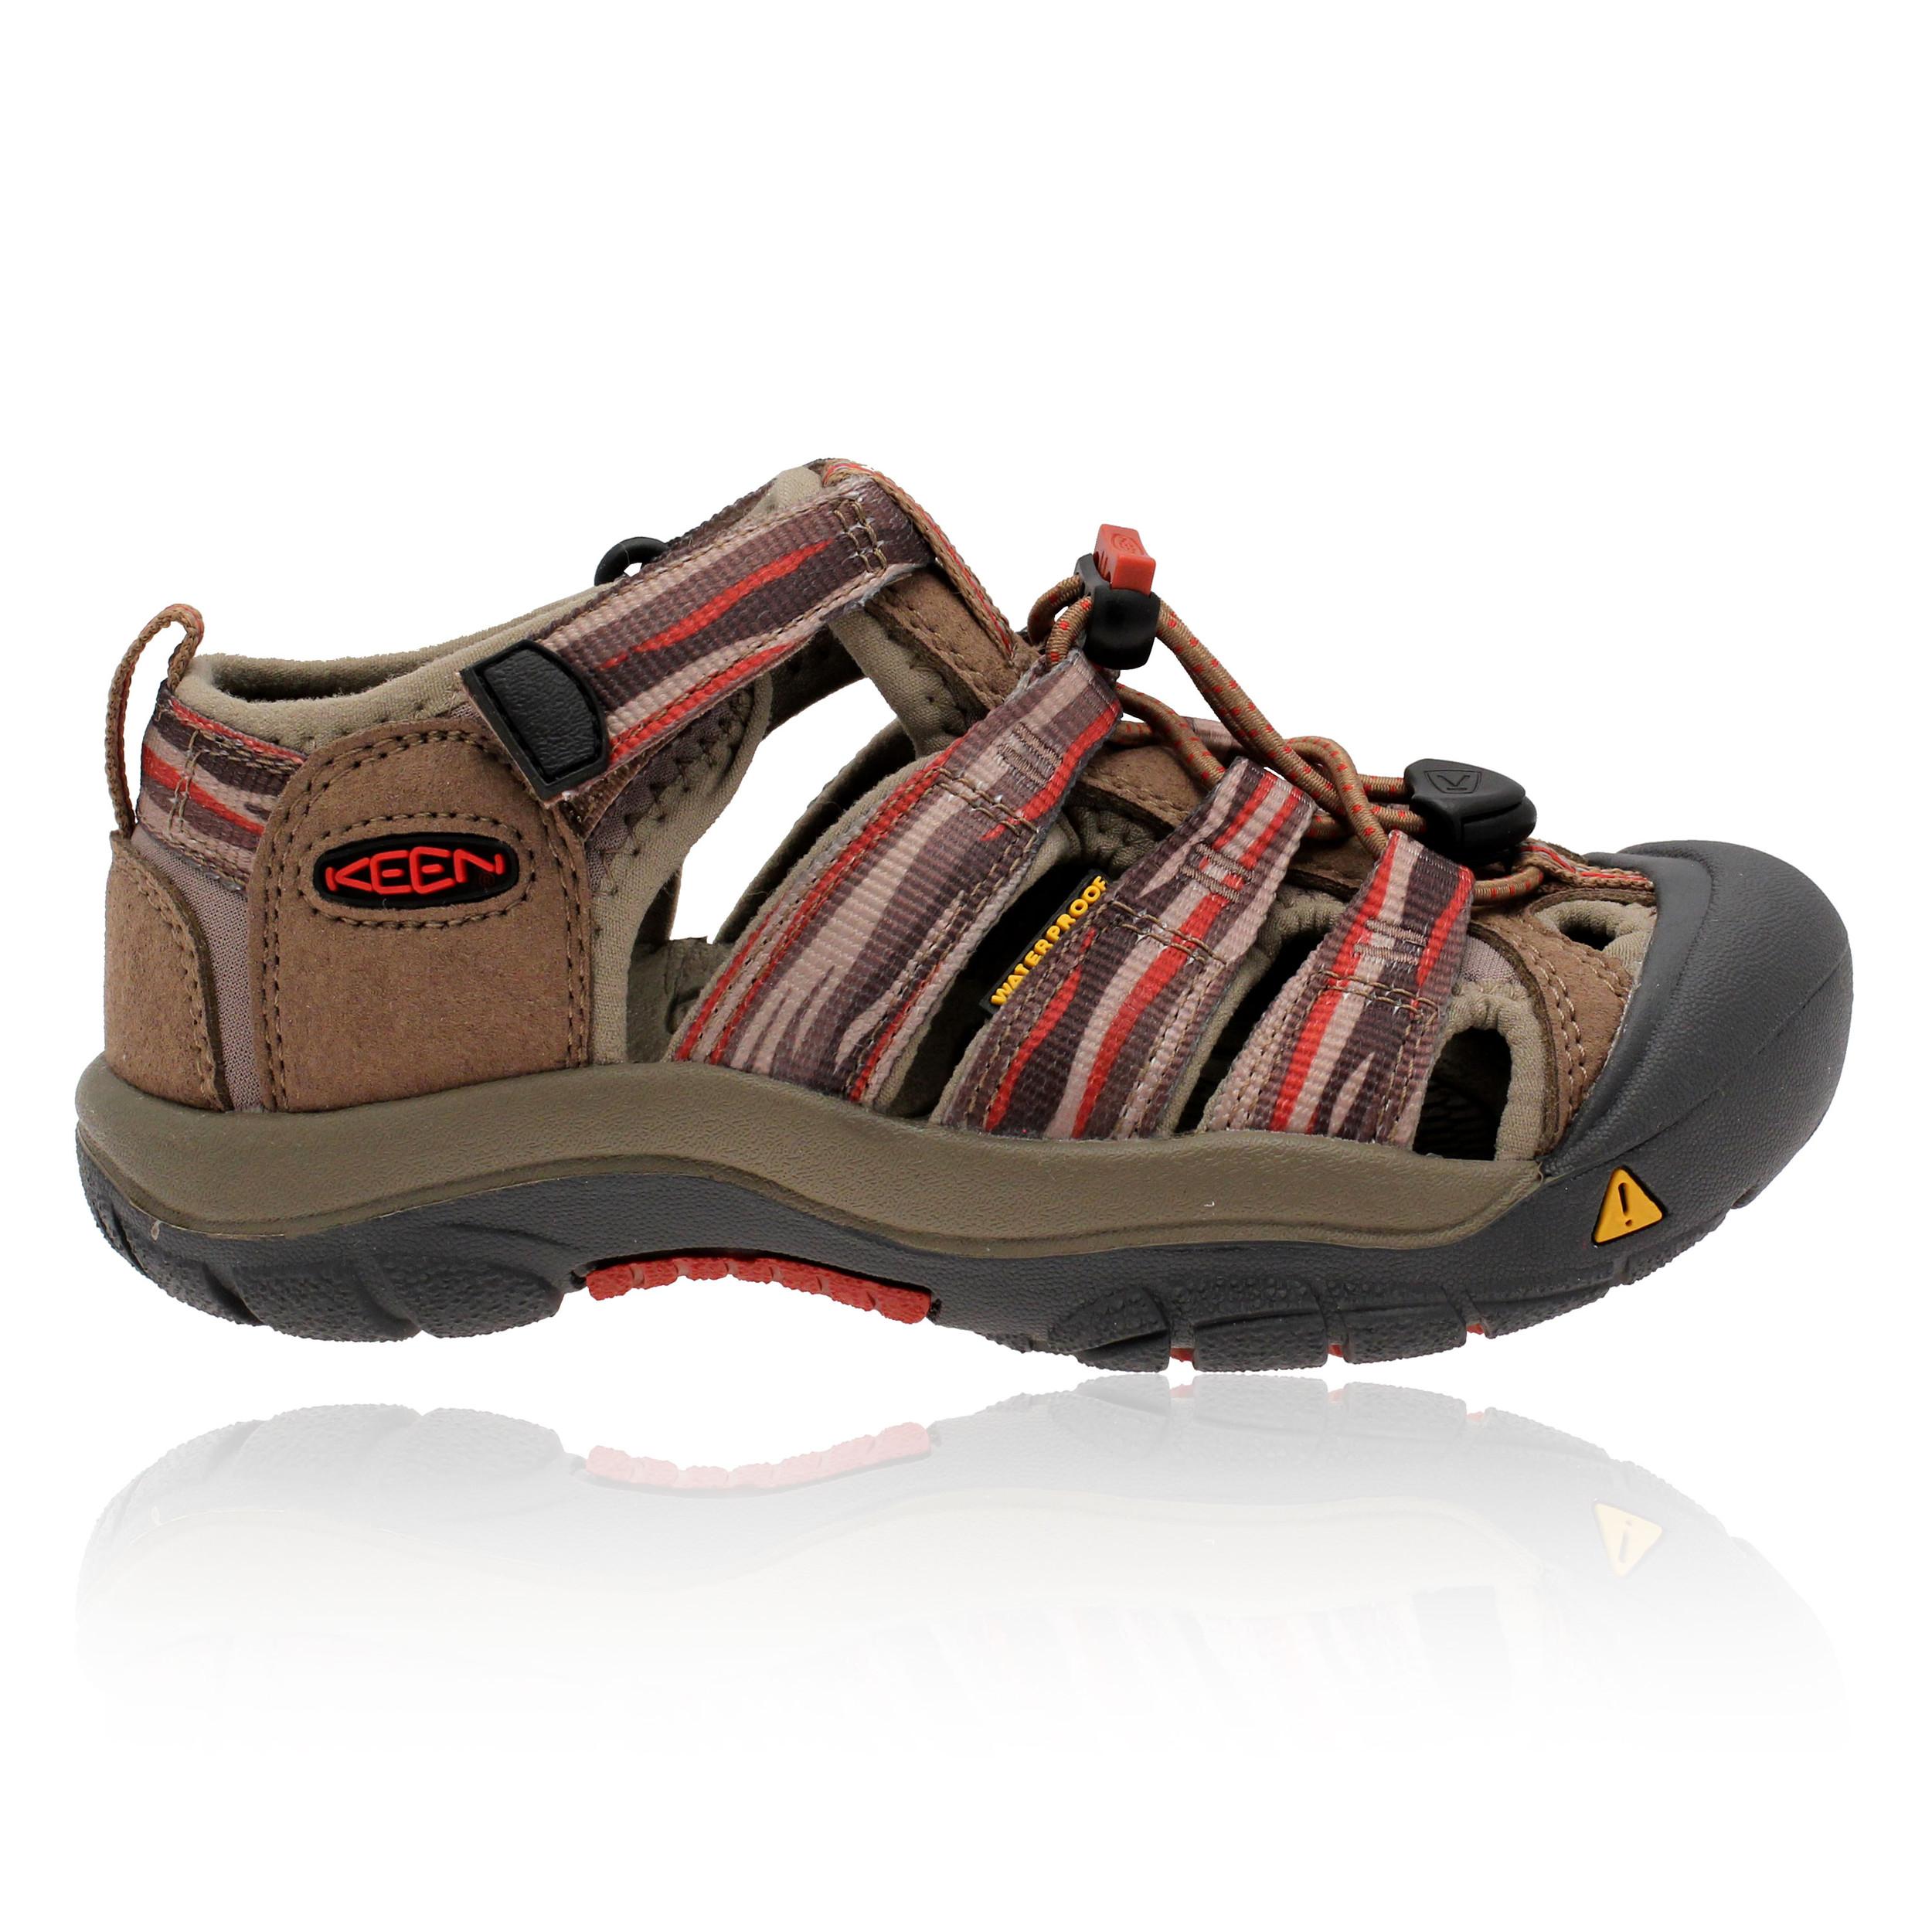 Keen H2 Junior Walking Shoes